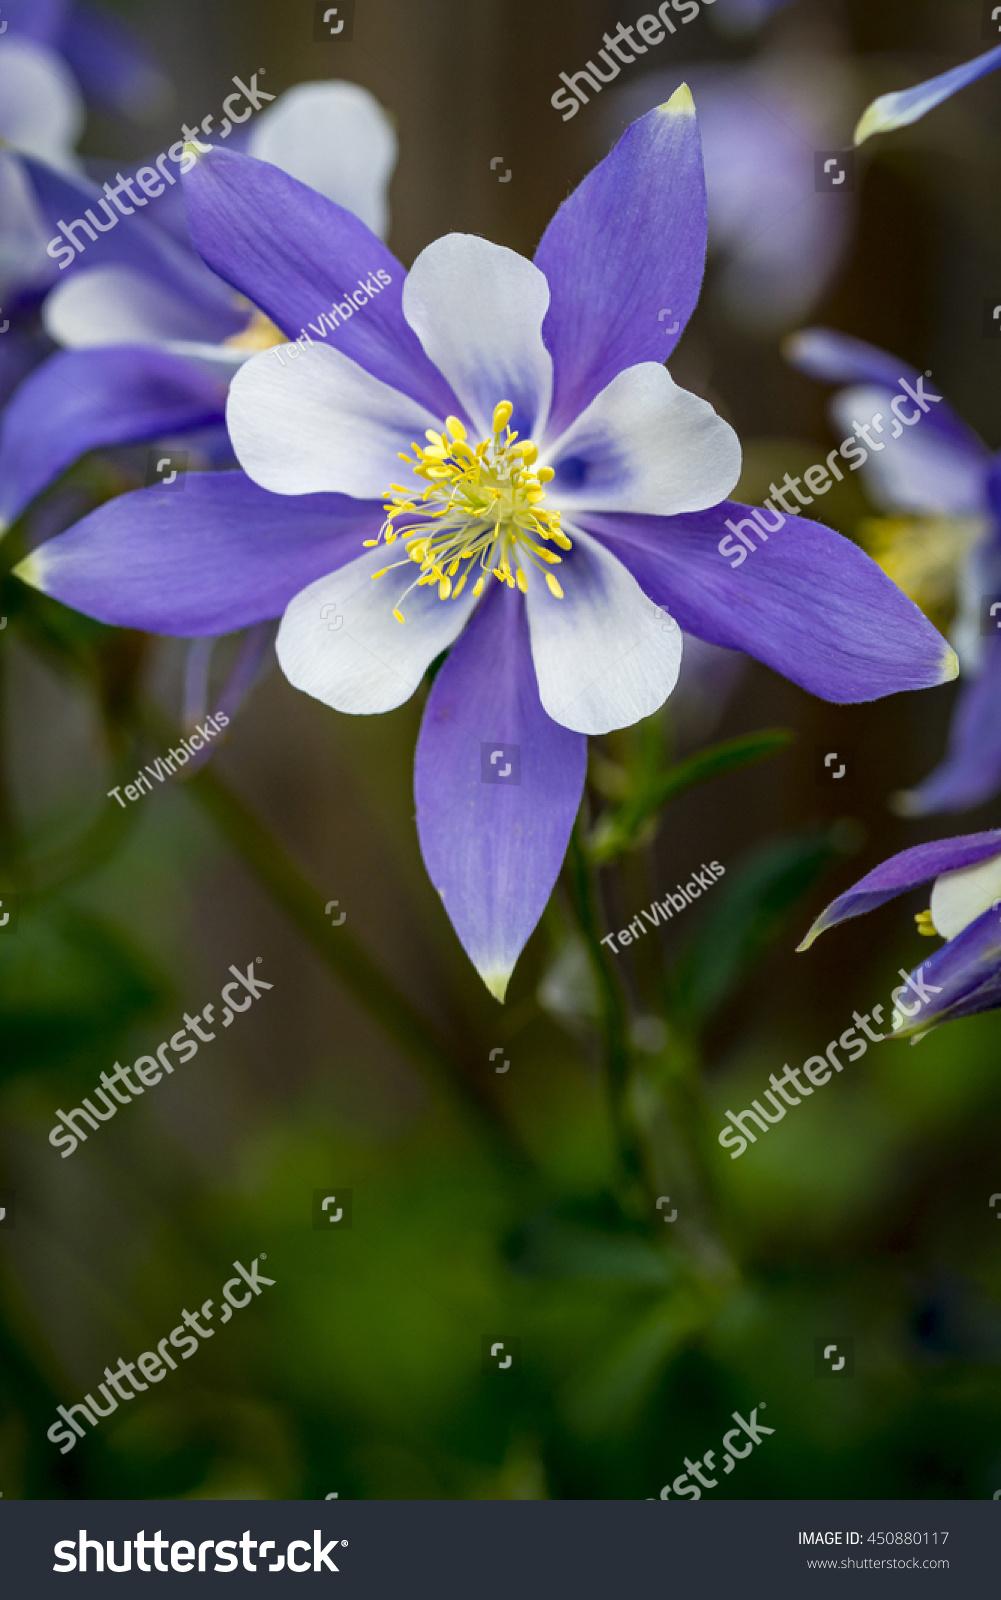 Single stem blue columbine flower bloom stock photo 100 legal single stem of blue columbine flower bloom on forest floor izmirmasajfo